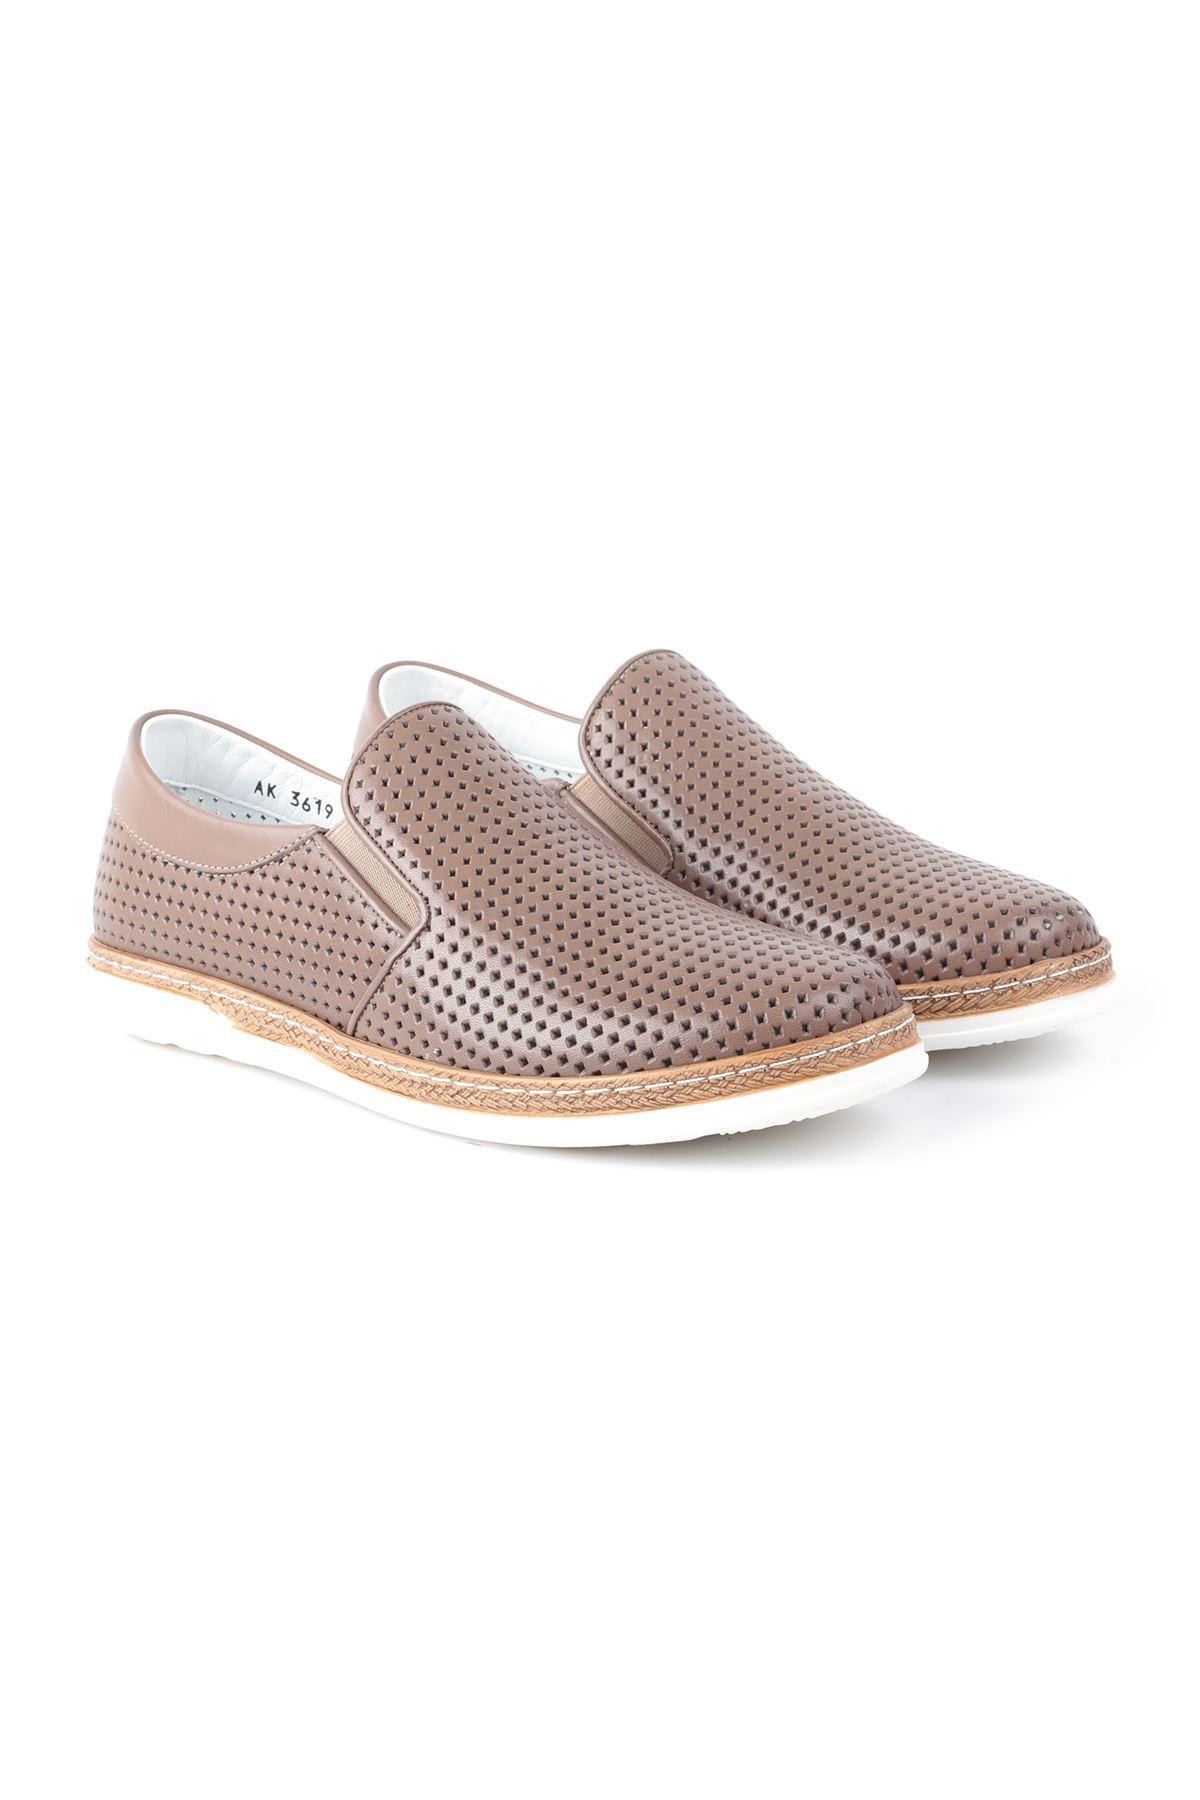 Libero L3619 Vizon Loafer Erkek Ayakkabı